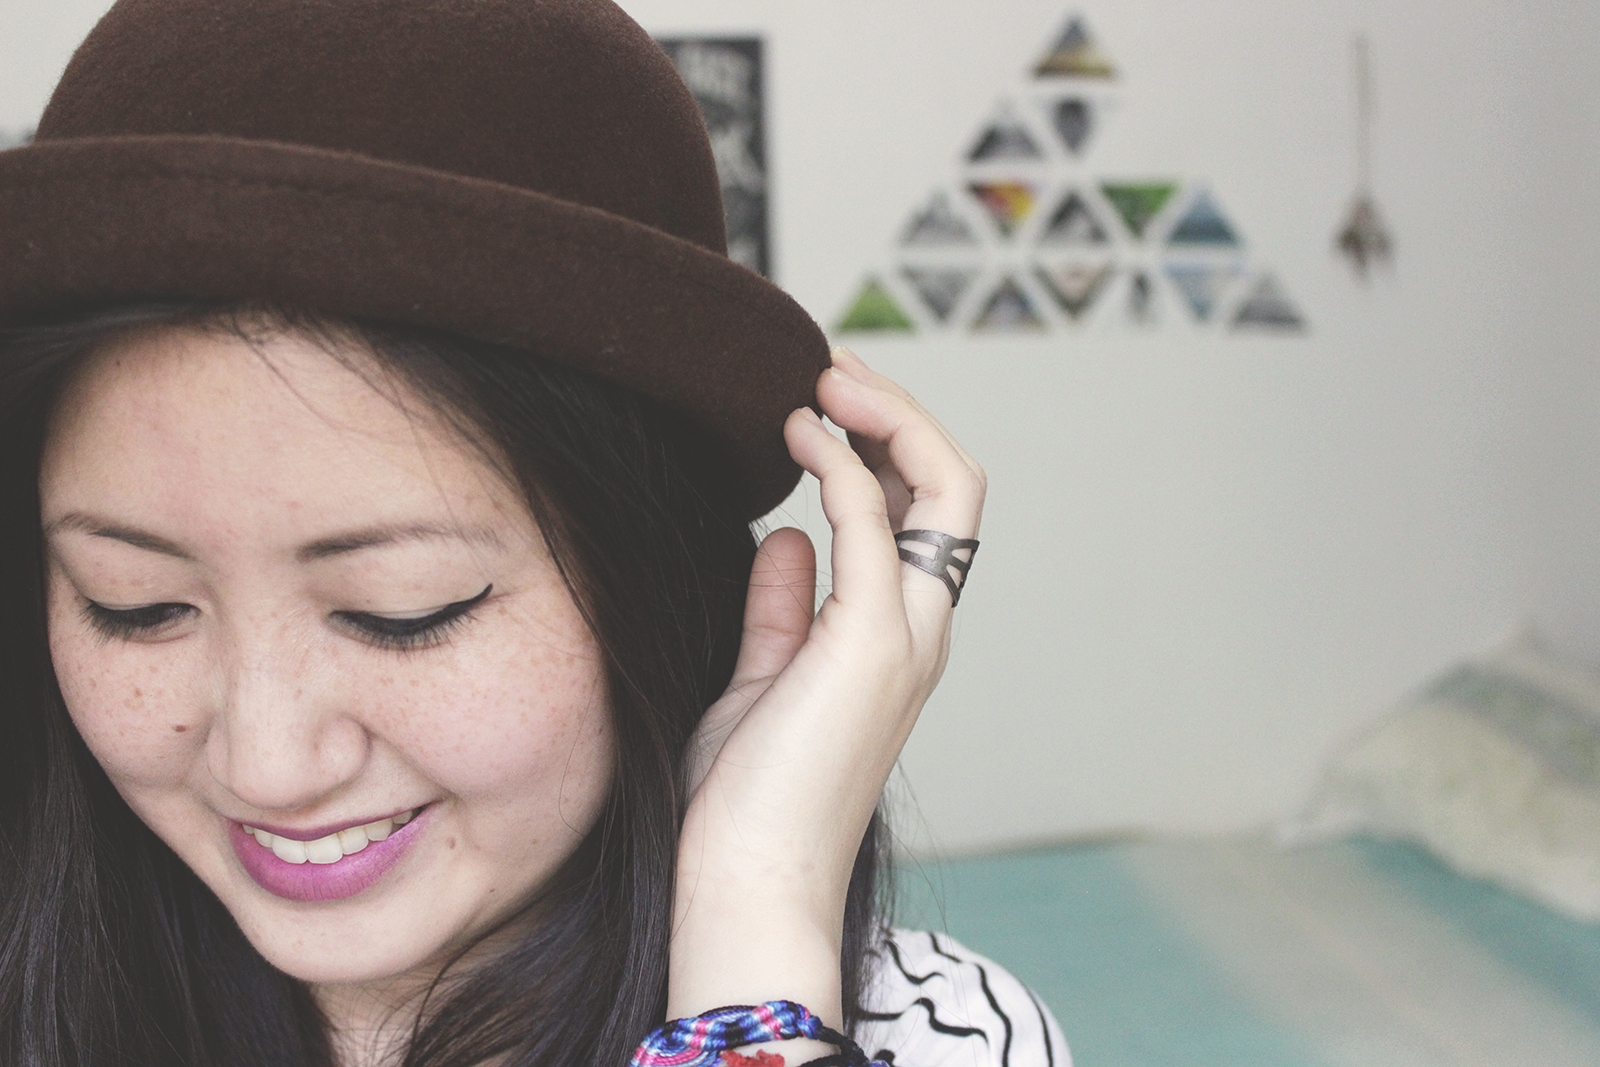 garota sorrindo chapéu redondo marrom